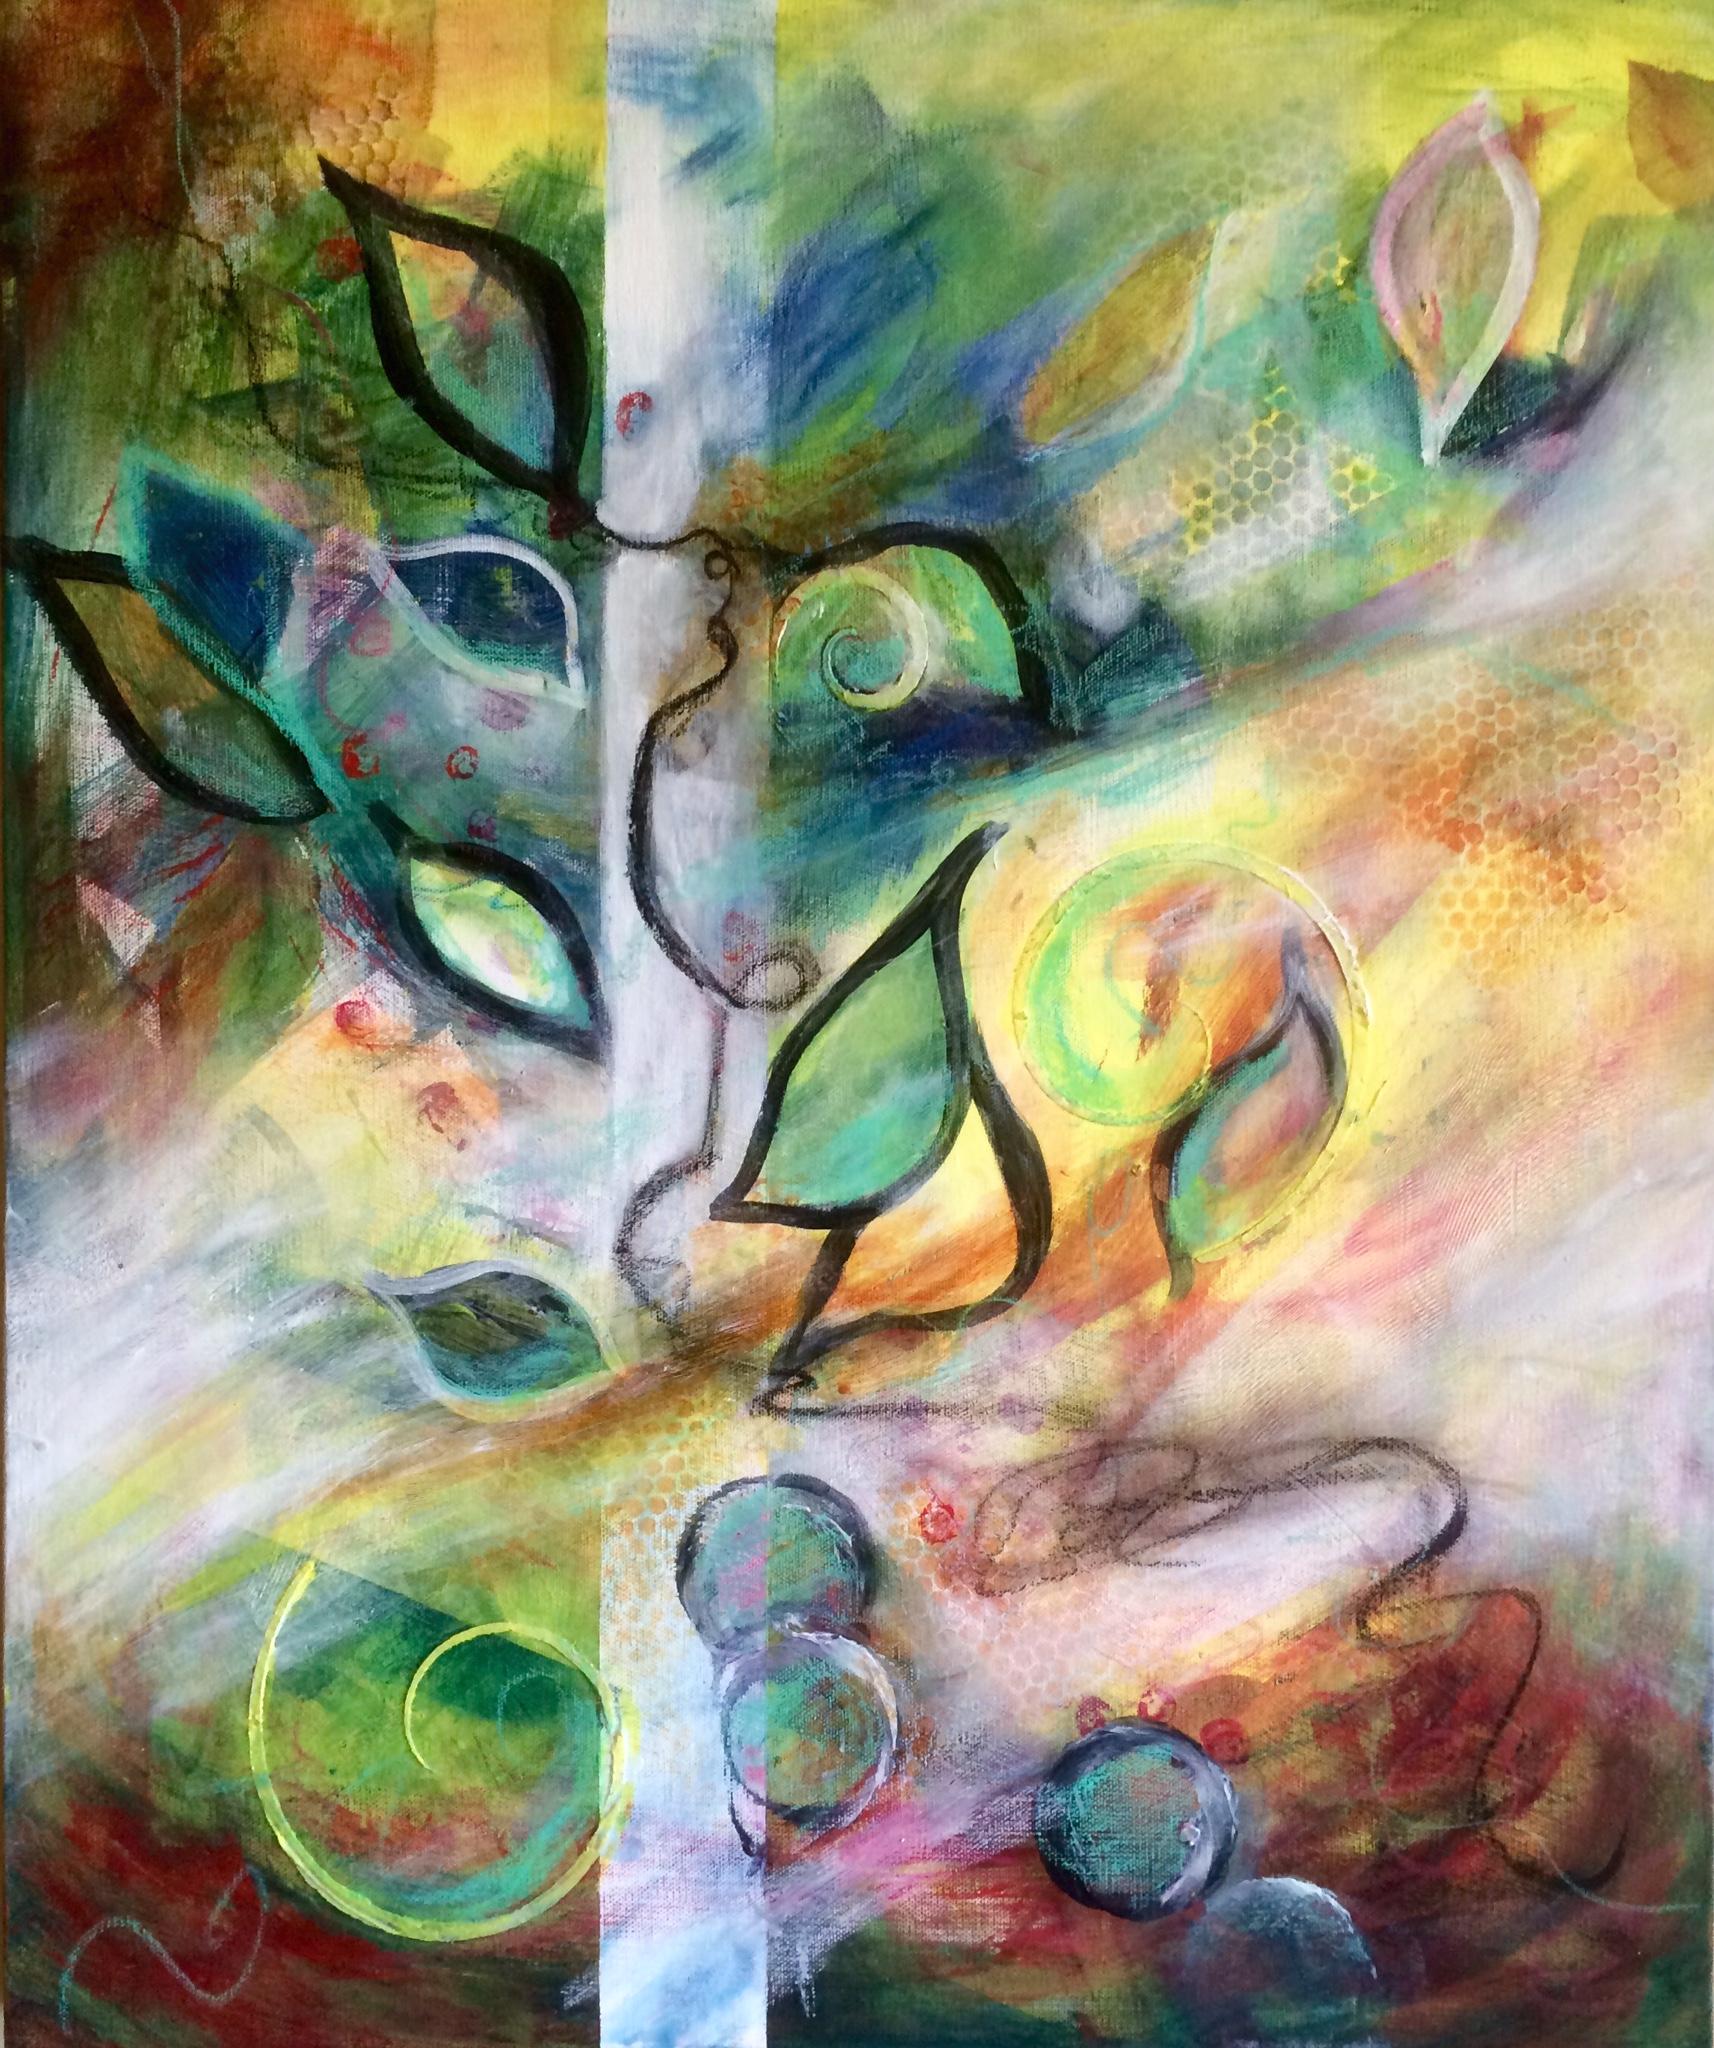 "Windblown - 24"" x 20"" Original Mixed Media on Canvas :: $295.00"